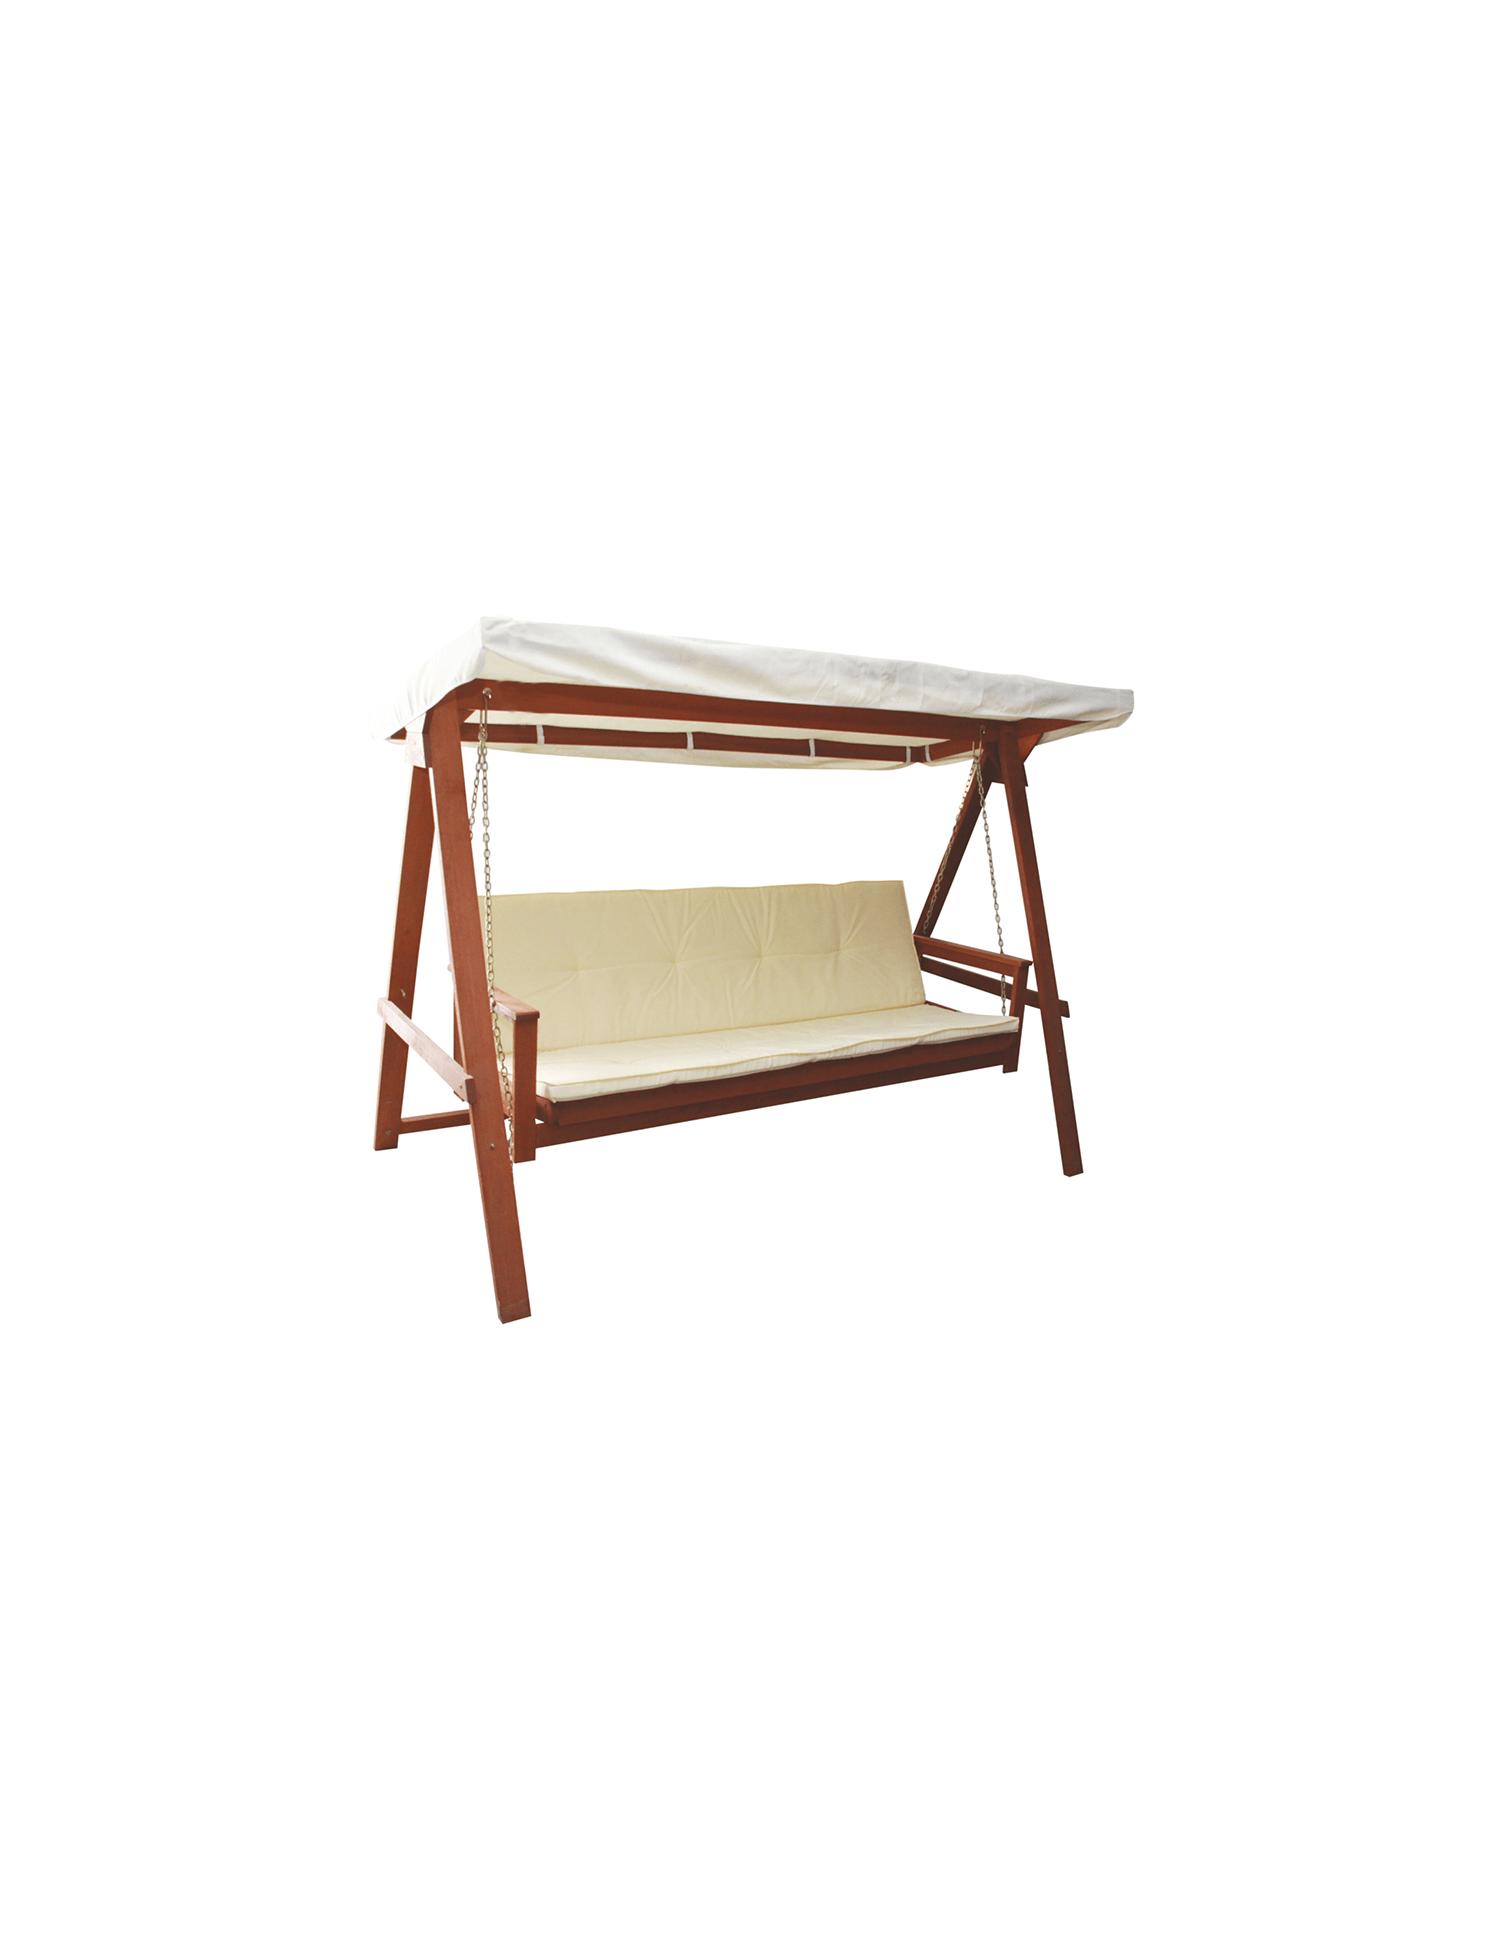 561a20d1bf9 SG15201. κούνια κρεβάτι SUNSHINE – GardenHome